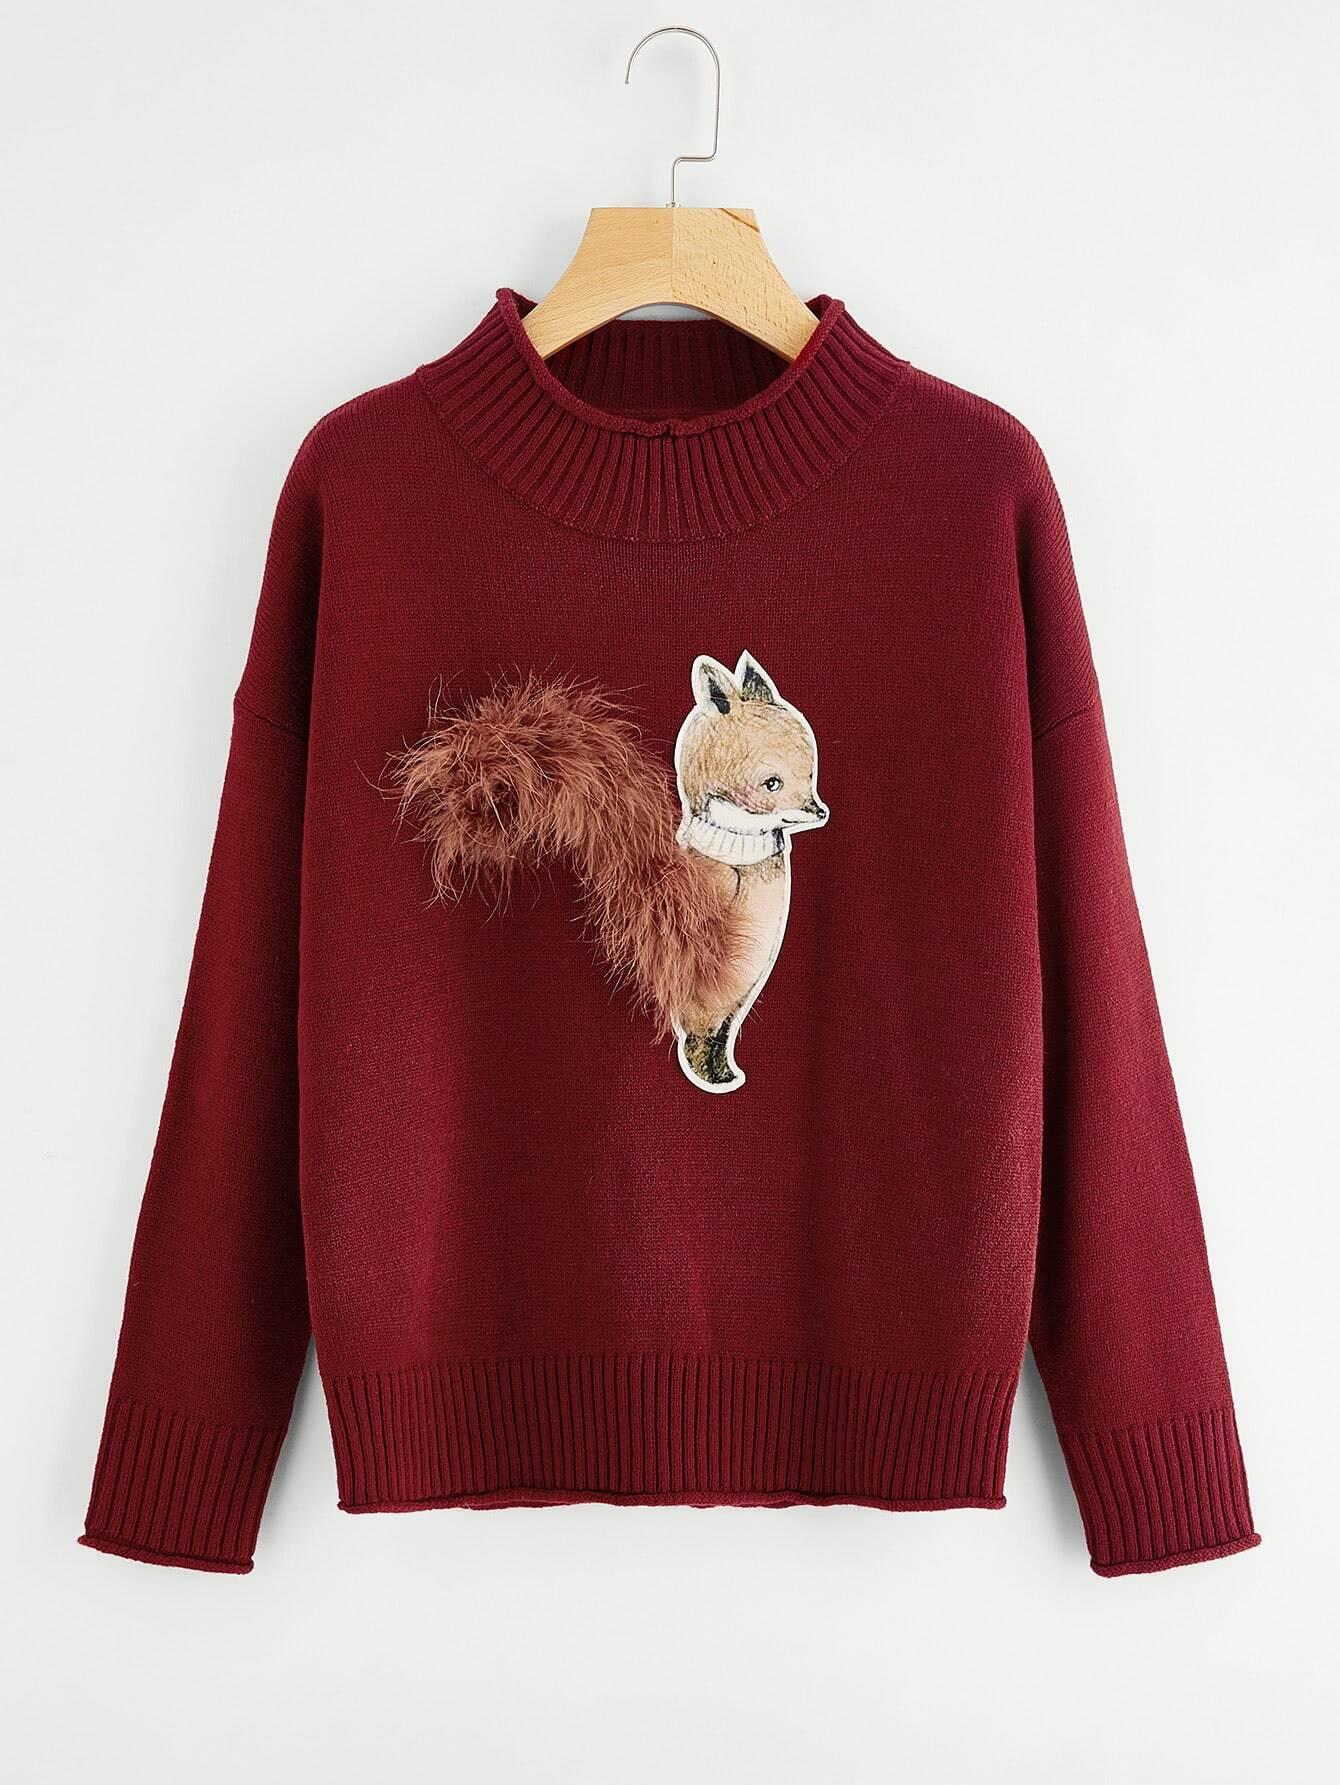 Ribbed Trim Fox Patch Jumper sweater170821471